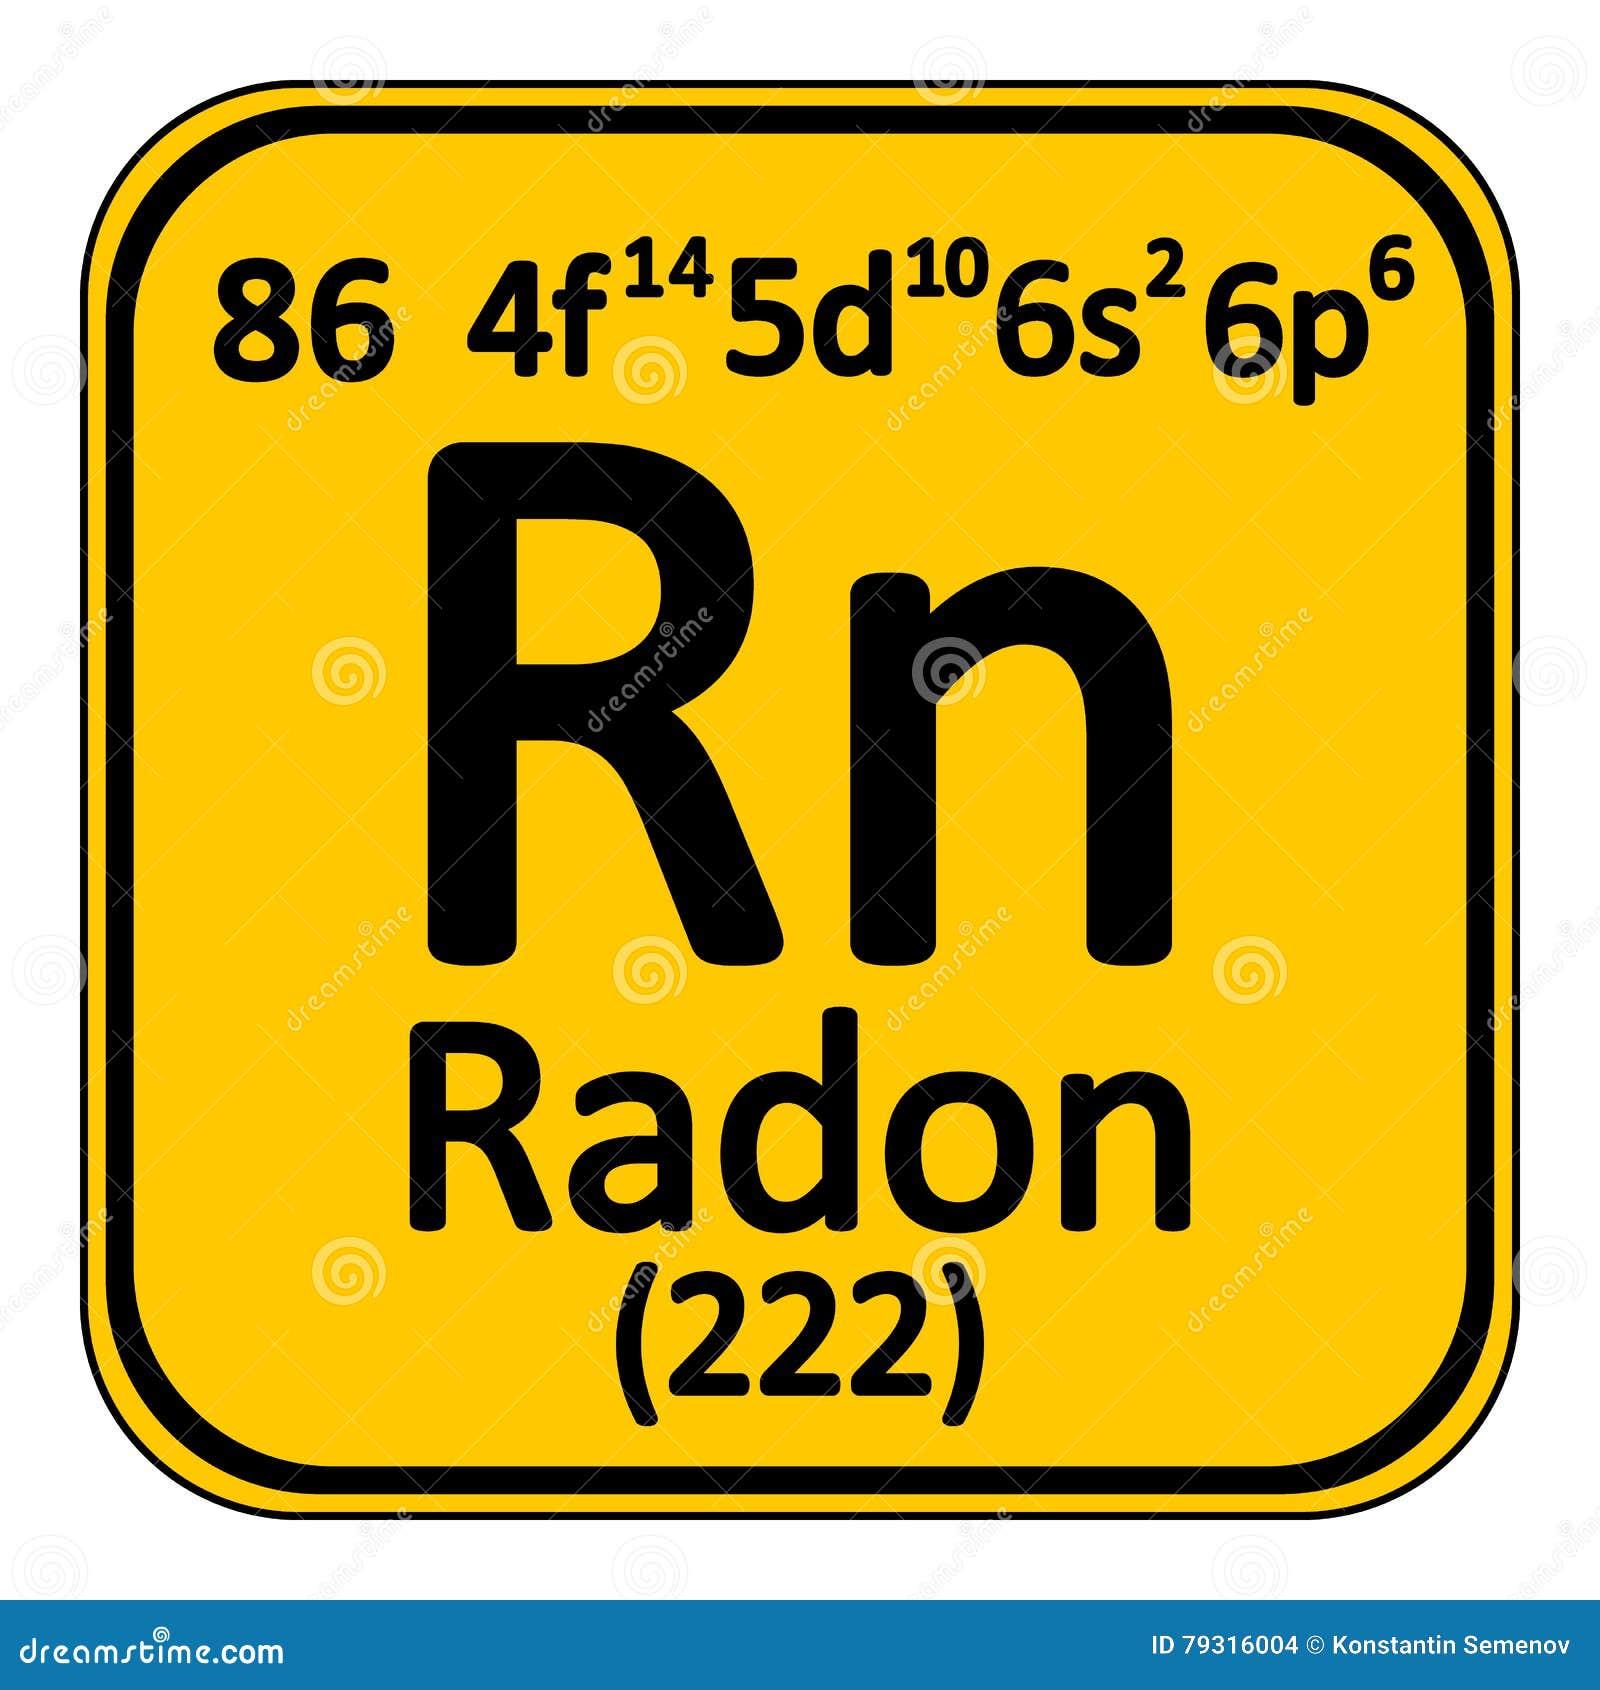 Periodic table element radon icon stock illustration image periodic table element radon icon gamestrikefo Images